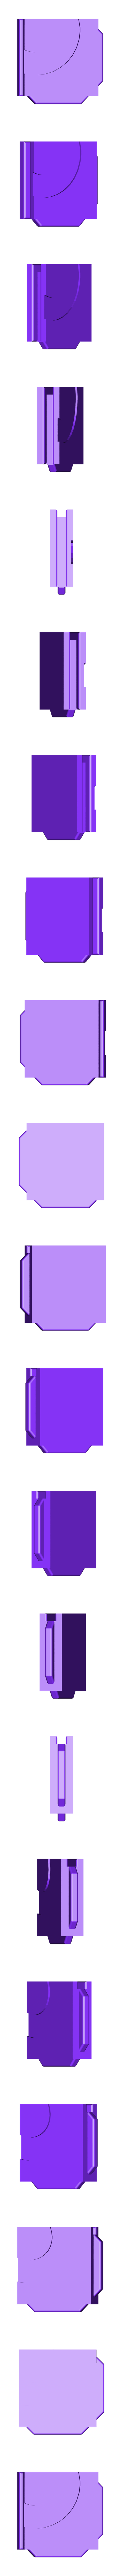 Piece - Part 19.stl Download free STL file Taquin CULTS / Sliding Puzzle • 3D print model, Valelab3D